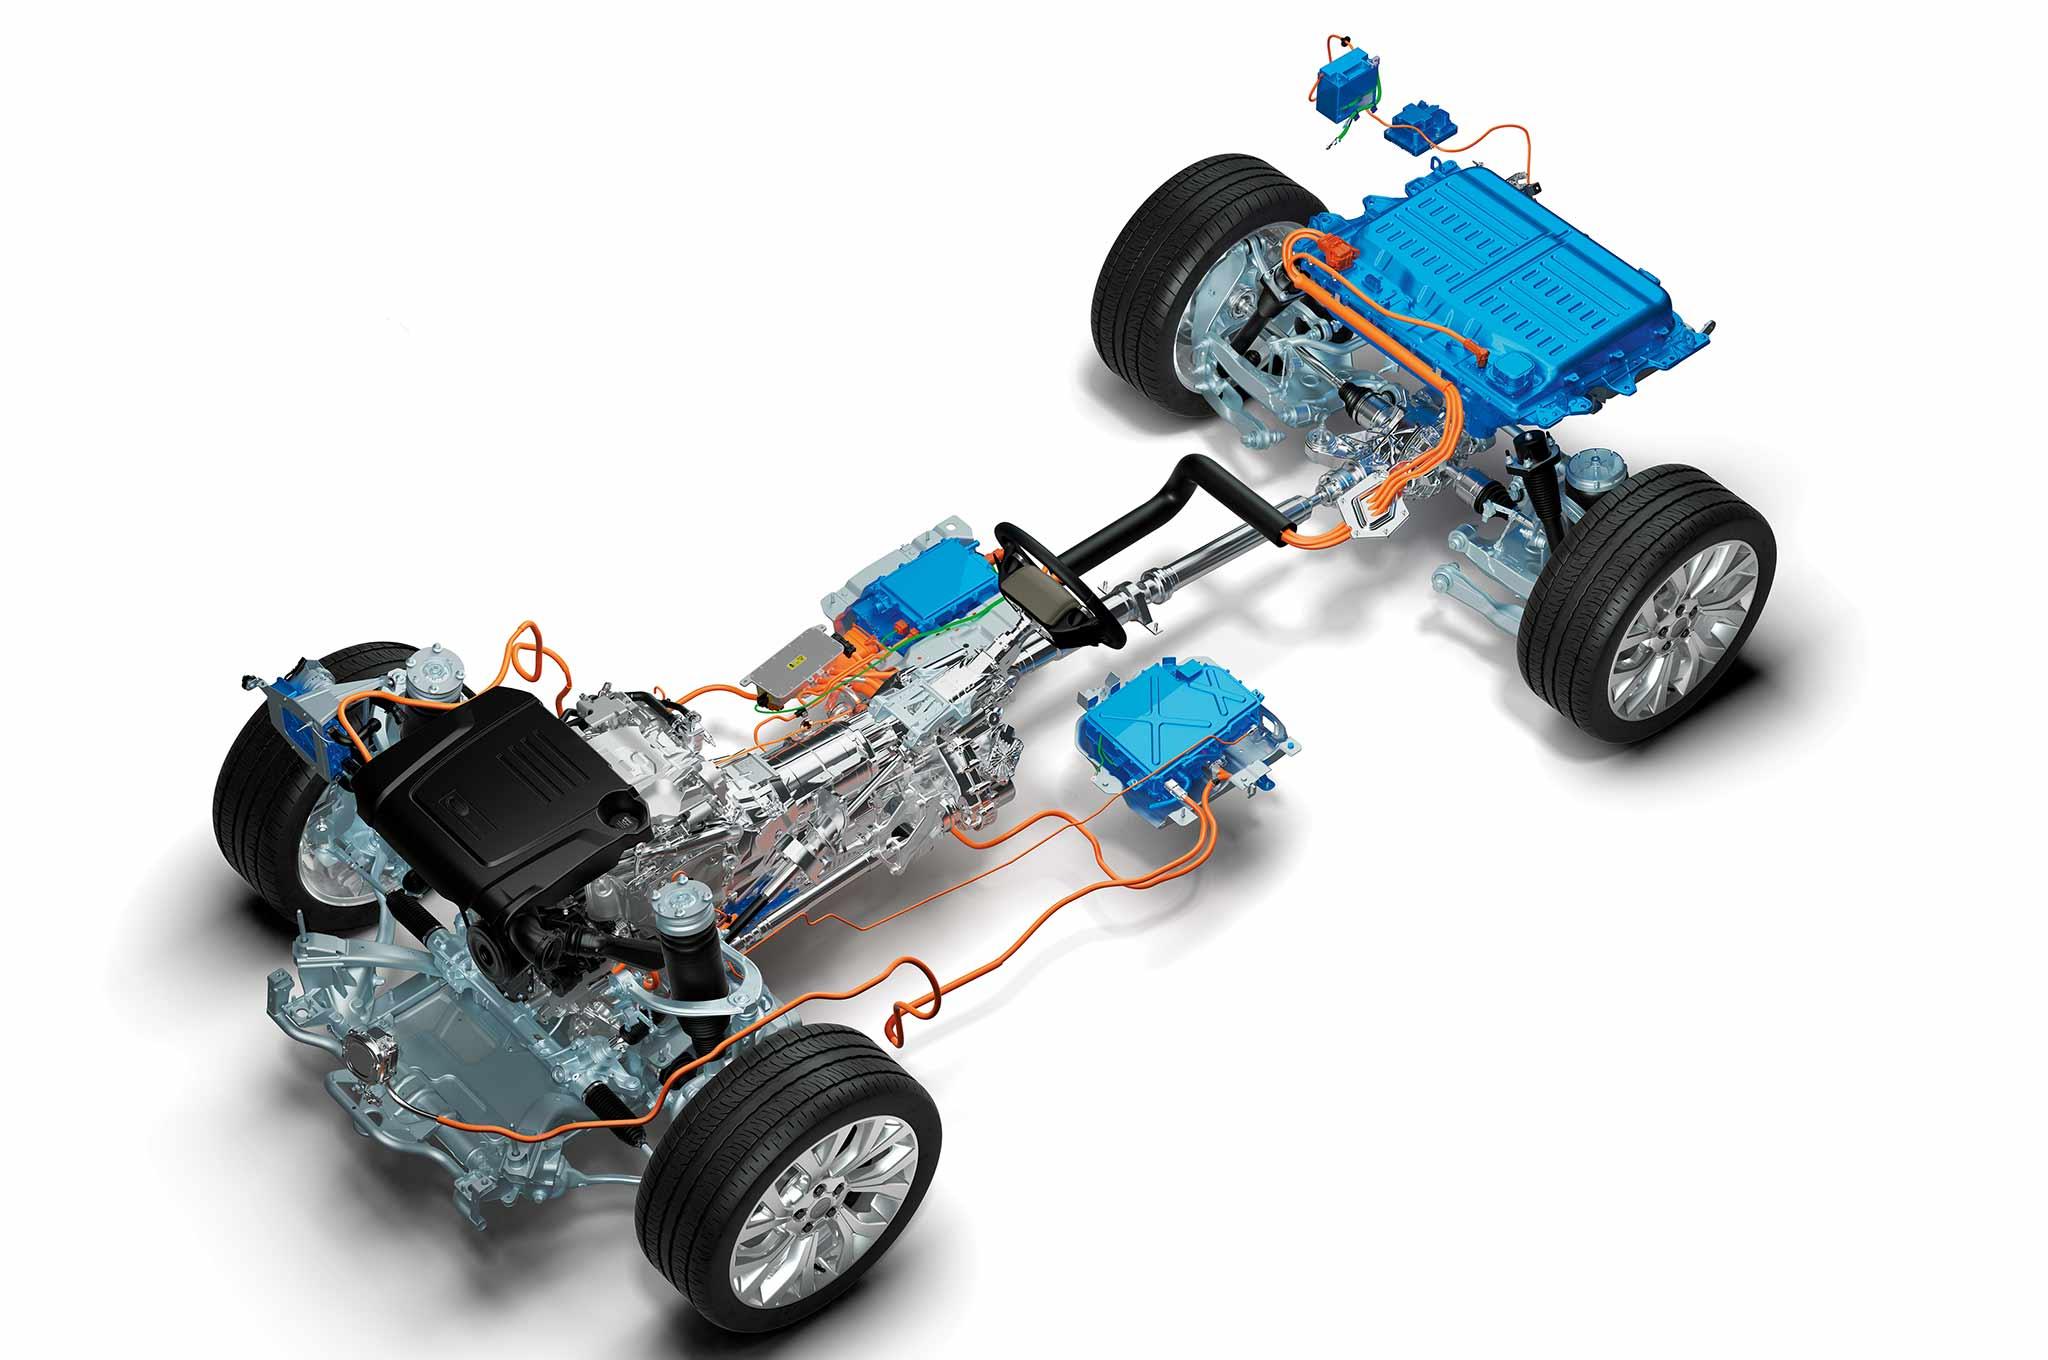 Hybrid Engine Diagram Of Mclaren S House Wiring Diagram Symbols \u2022 Honda  K-Series Engine Honda K20 Engine Diagram